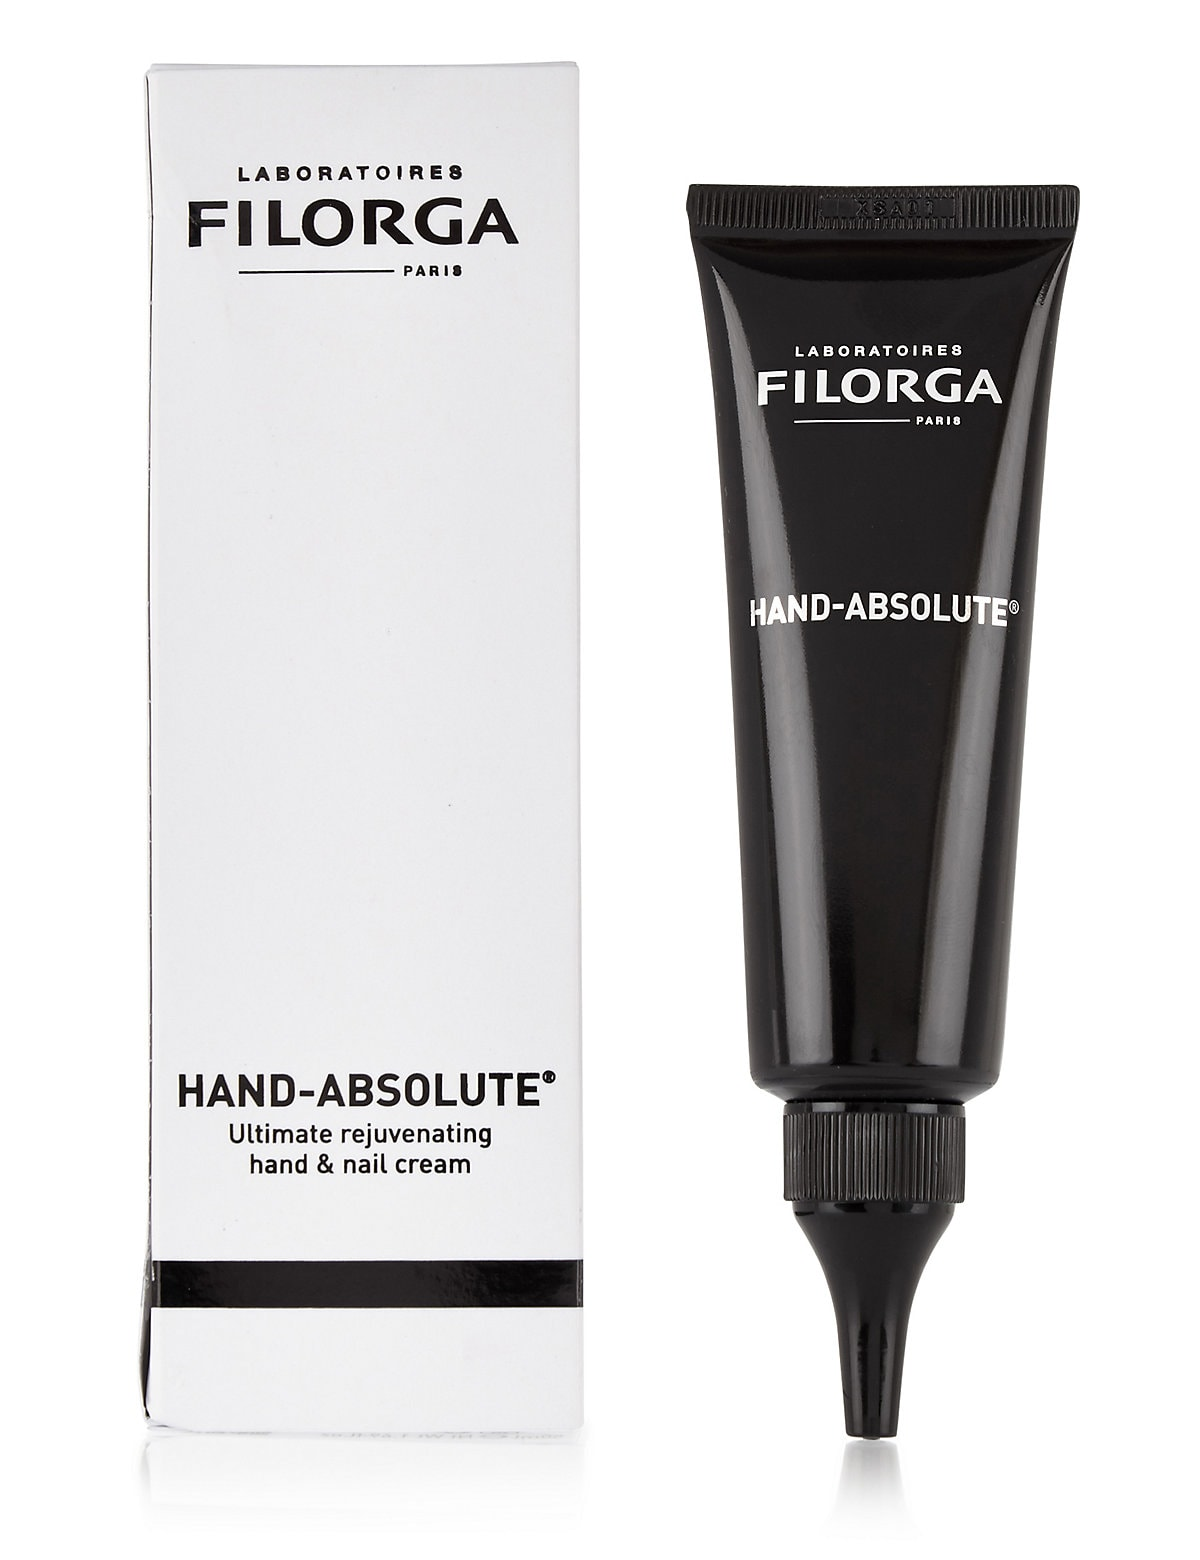 FILORGA Hand-Absolute® Ultimate Rejuvenating Hand & Nail Cream